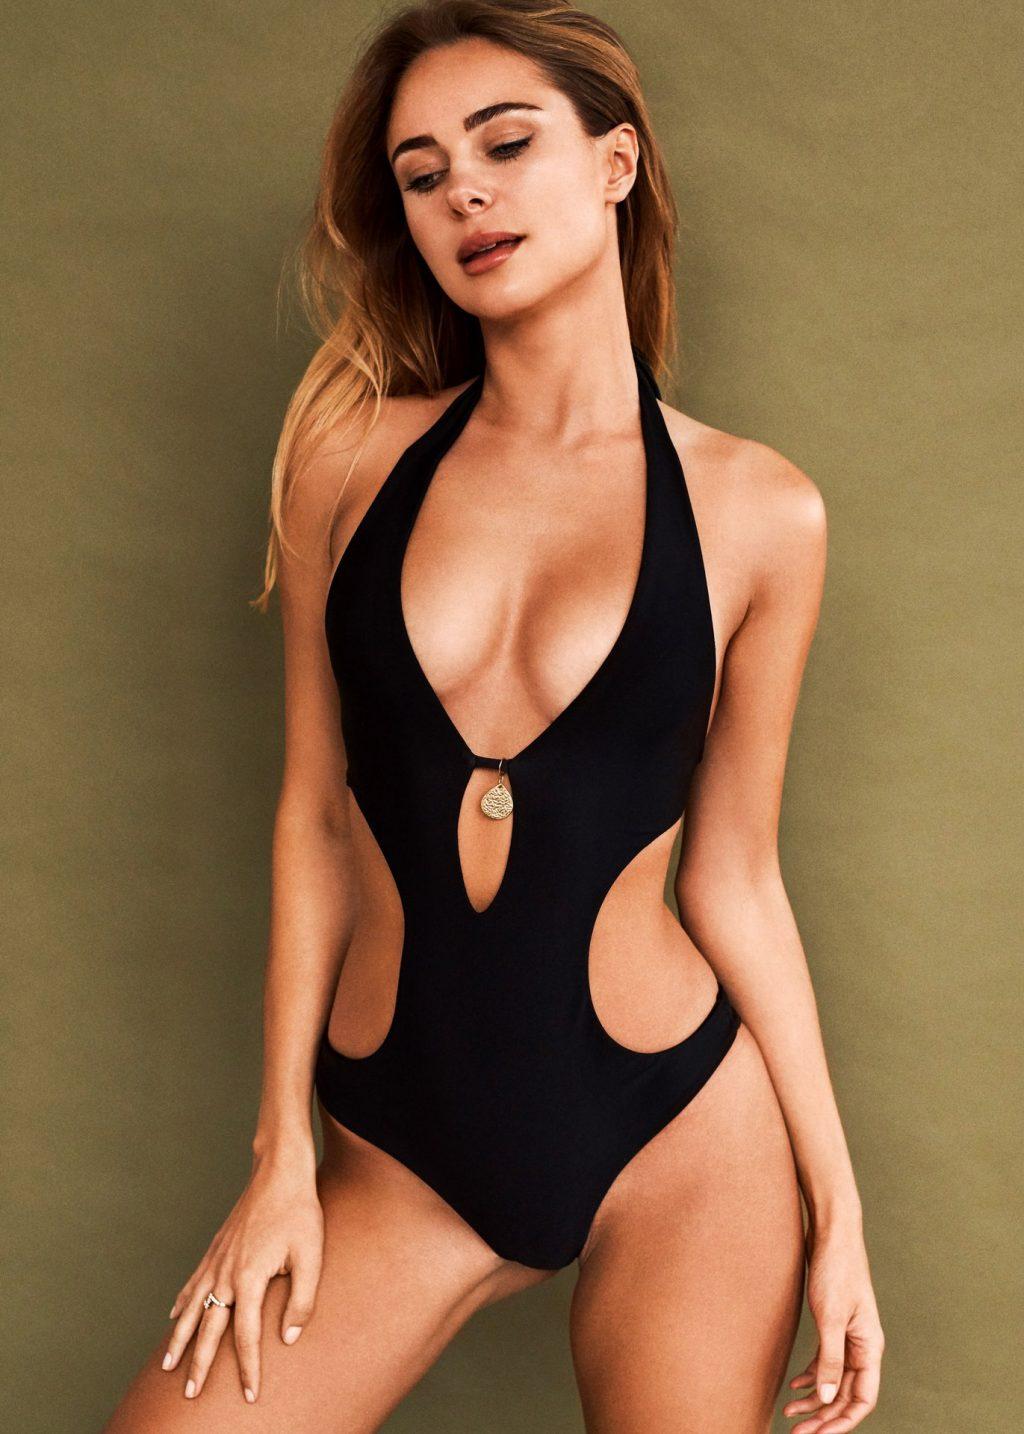 Kimberley Garner Sexy (10 Hot Photos)